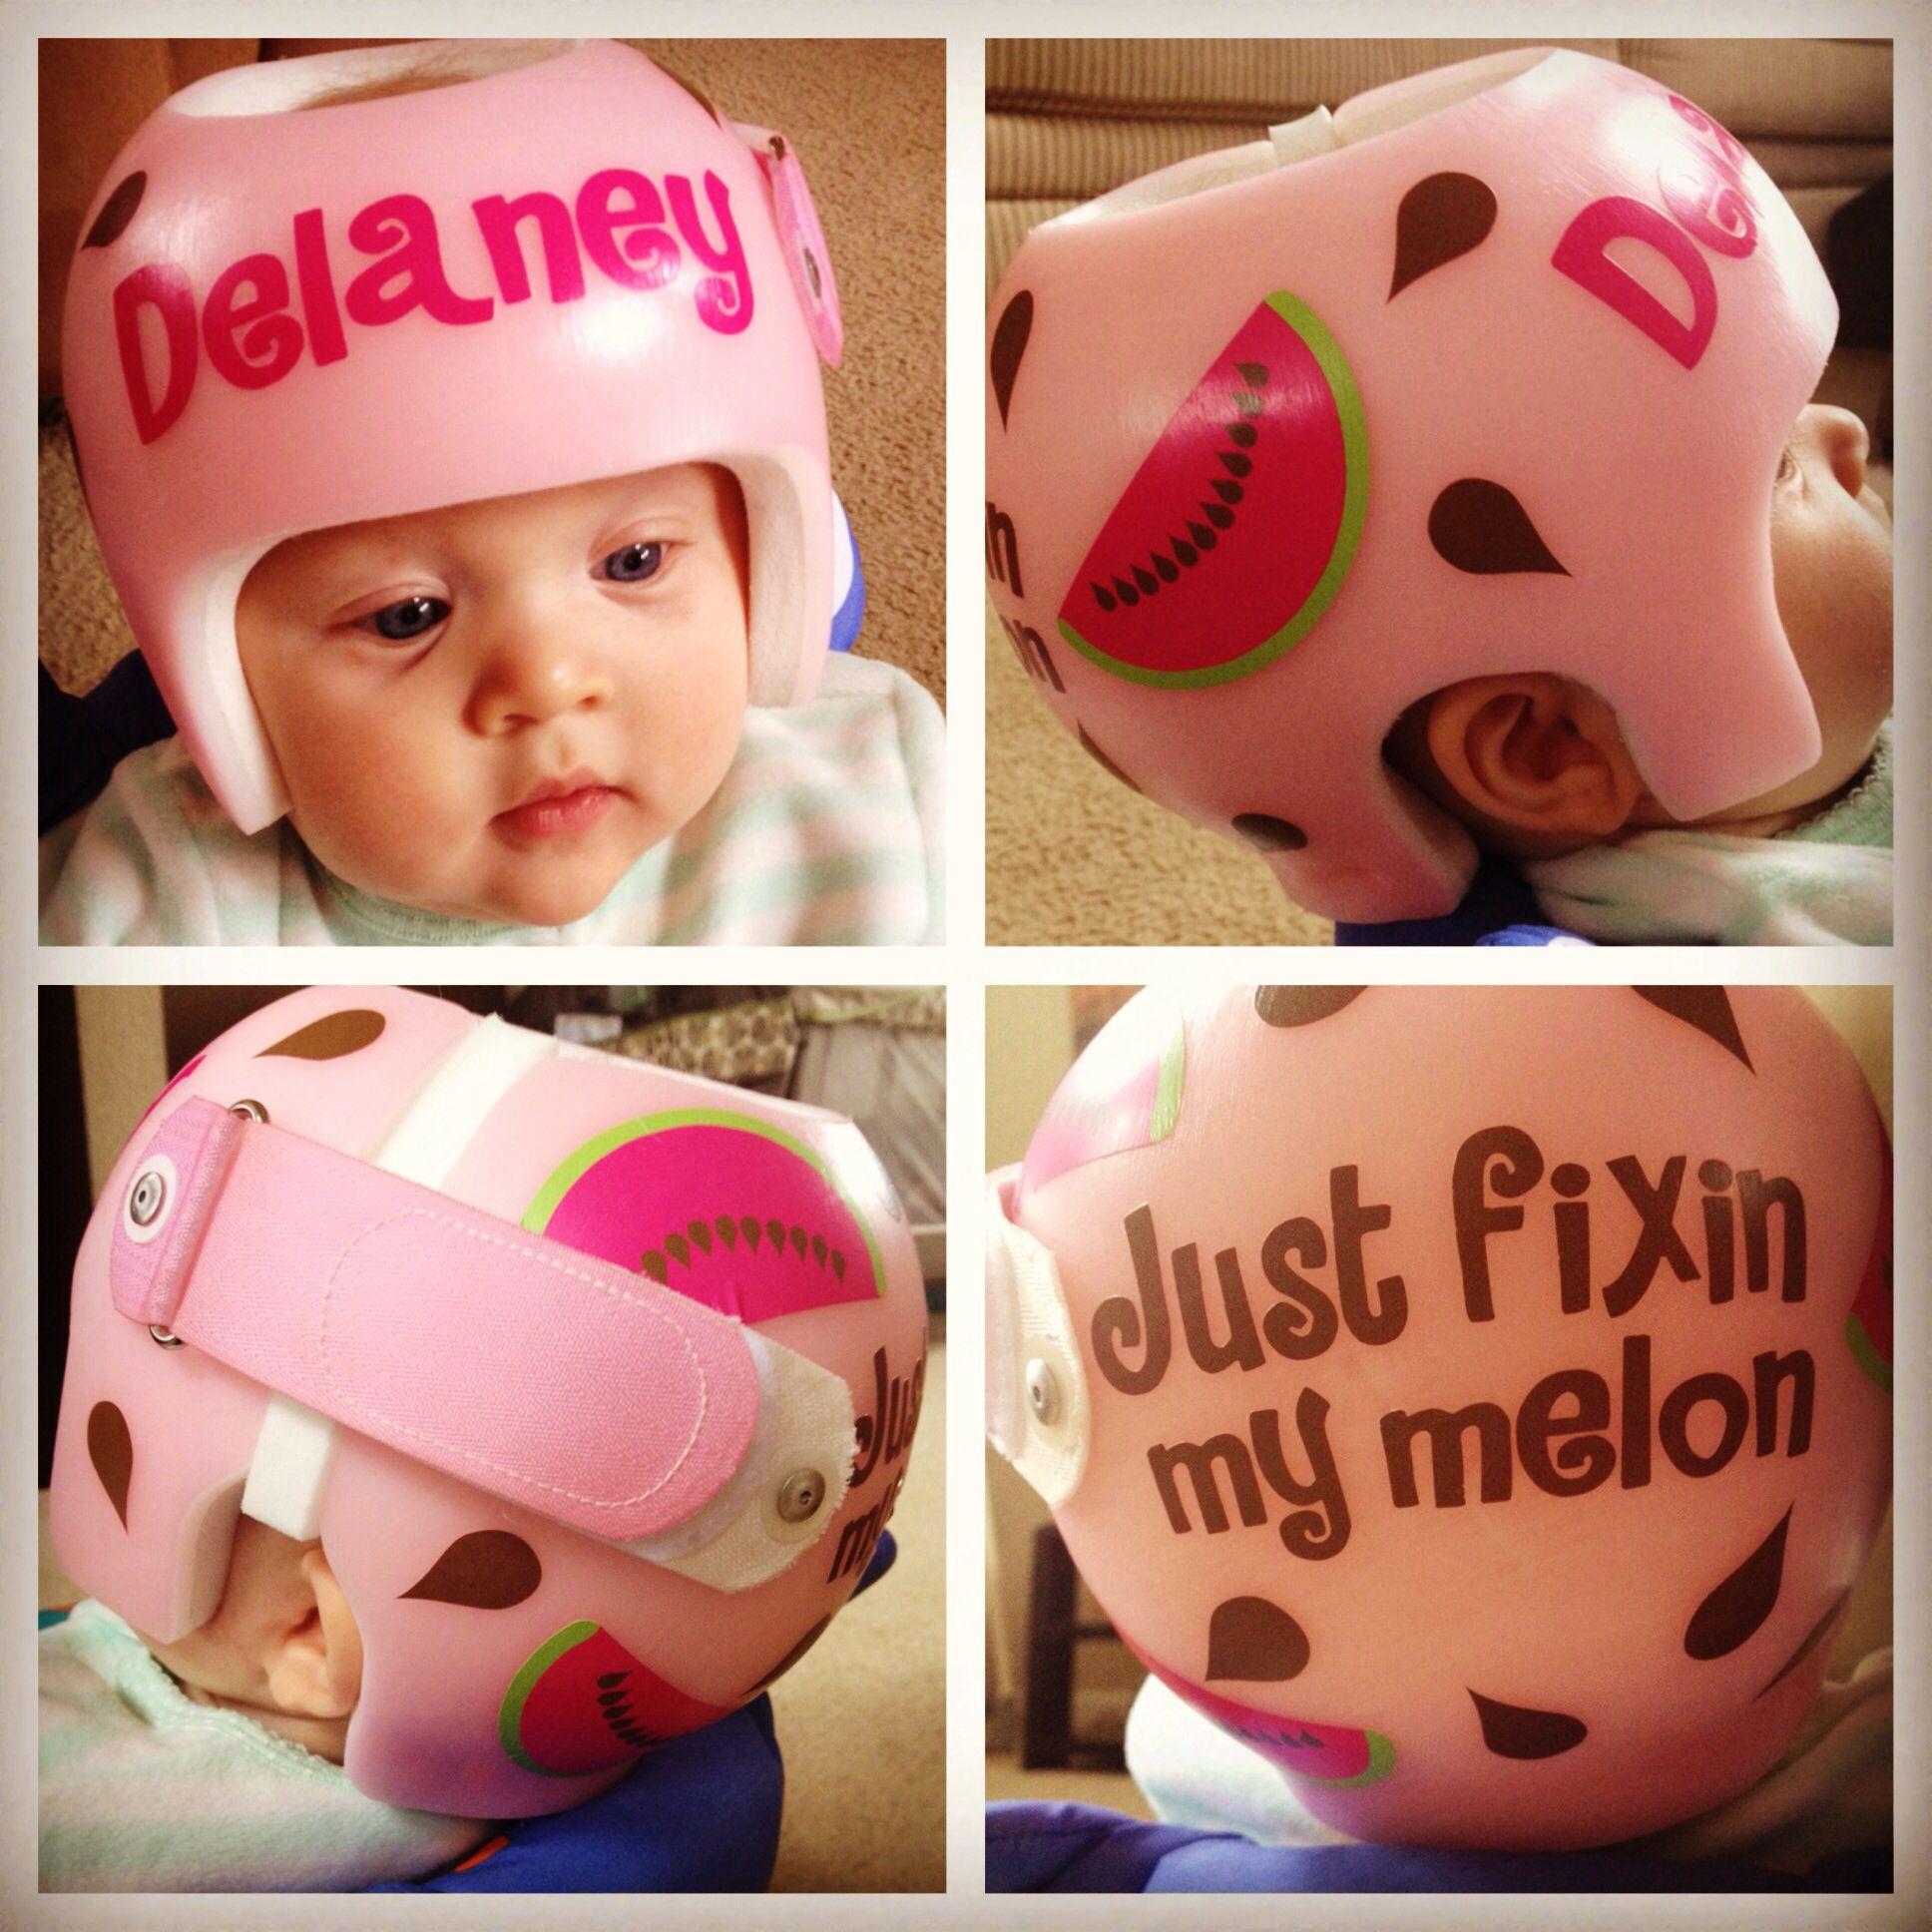 Helmet for plagiocephaly baby helmet plagiocephaly helmets baby shoes doc band kids